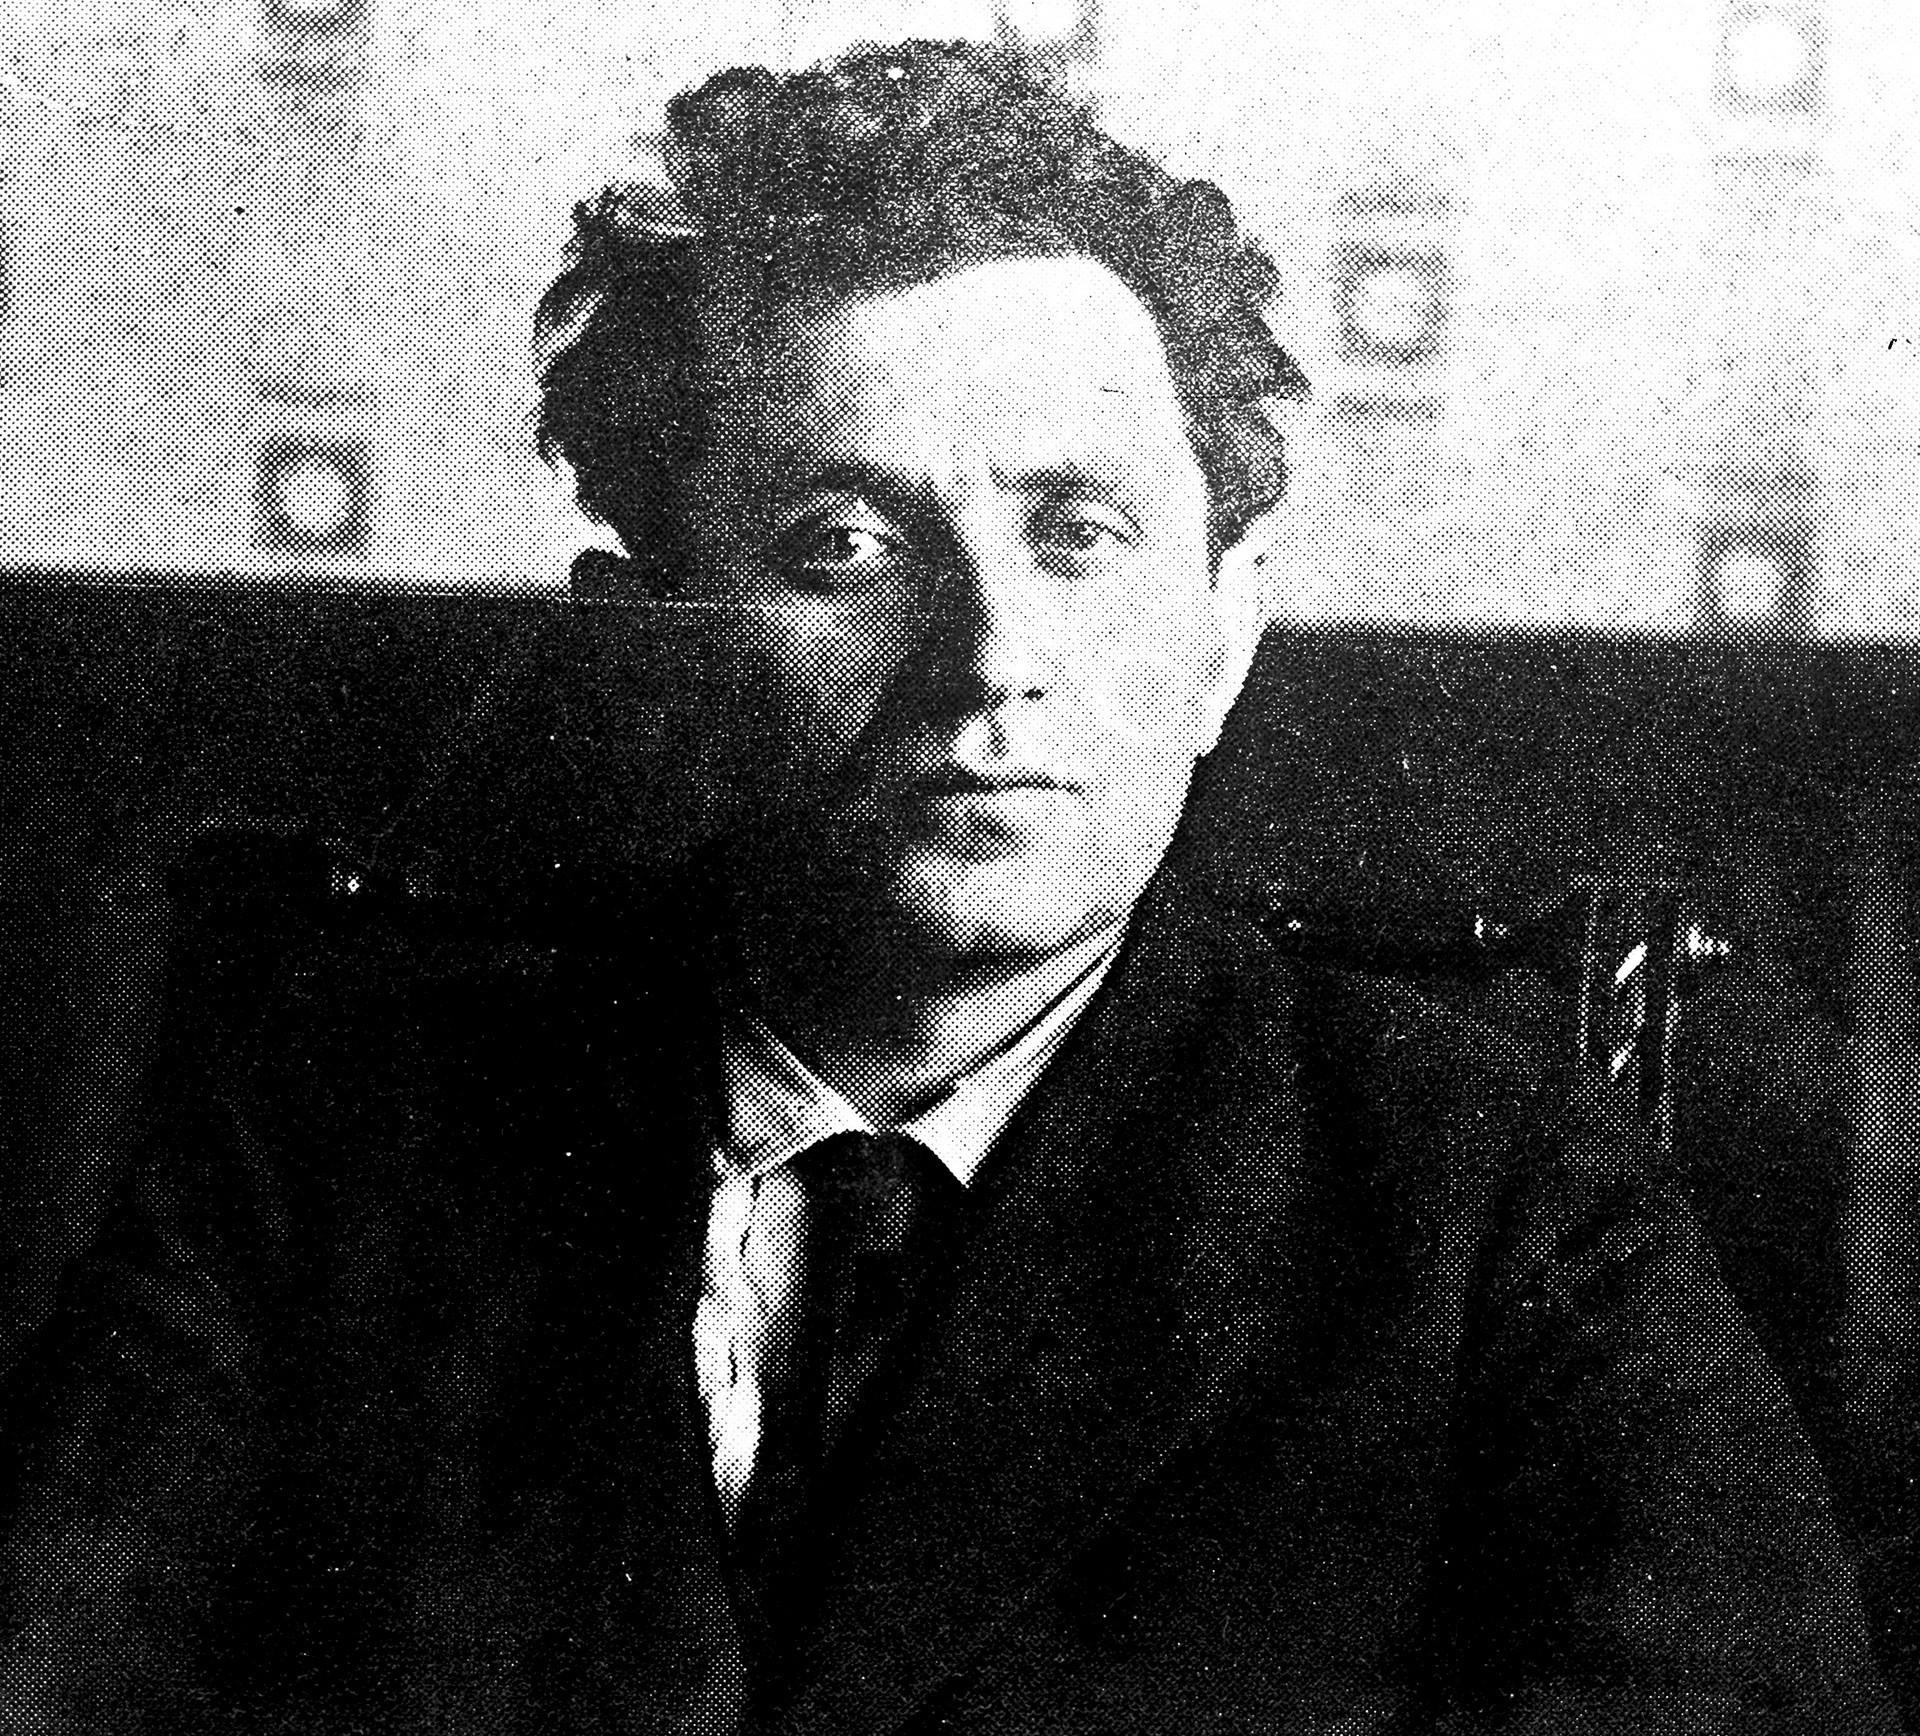 Grigoriy Zinoviev, born Hirsch Apfelbaum (1883 - 1936)